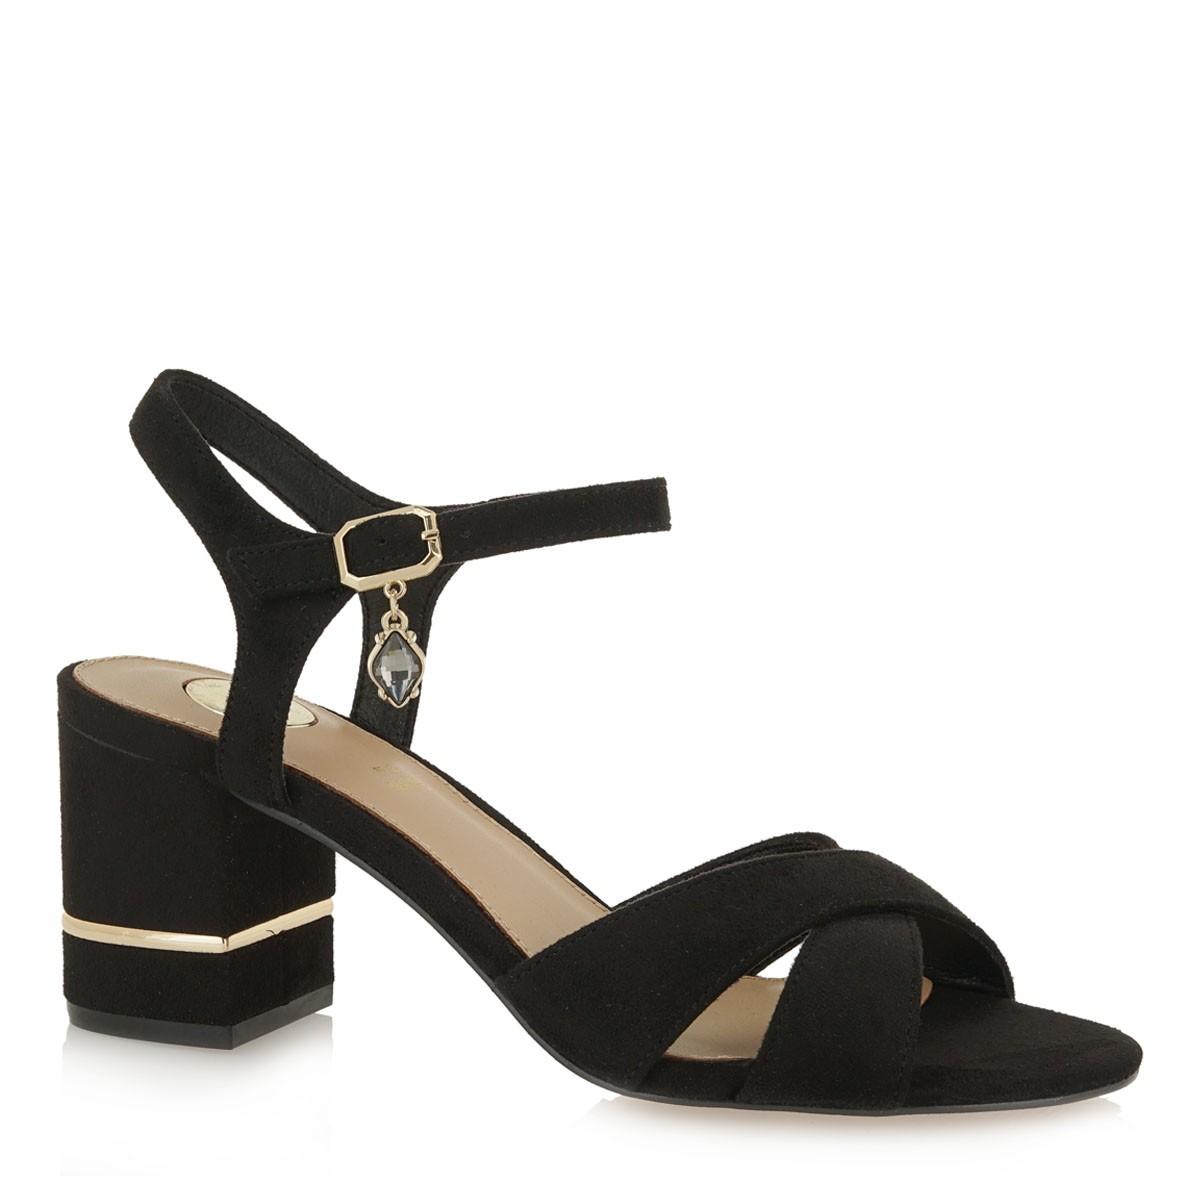 EXE Shoes Πέδιλα Γυναικεία PENNY-225 Μαύρο Καστόρι K47002254004